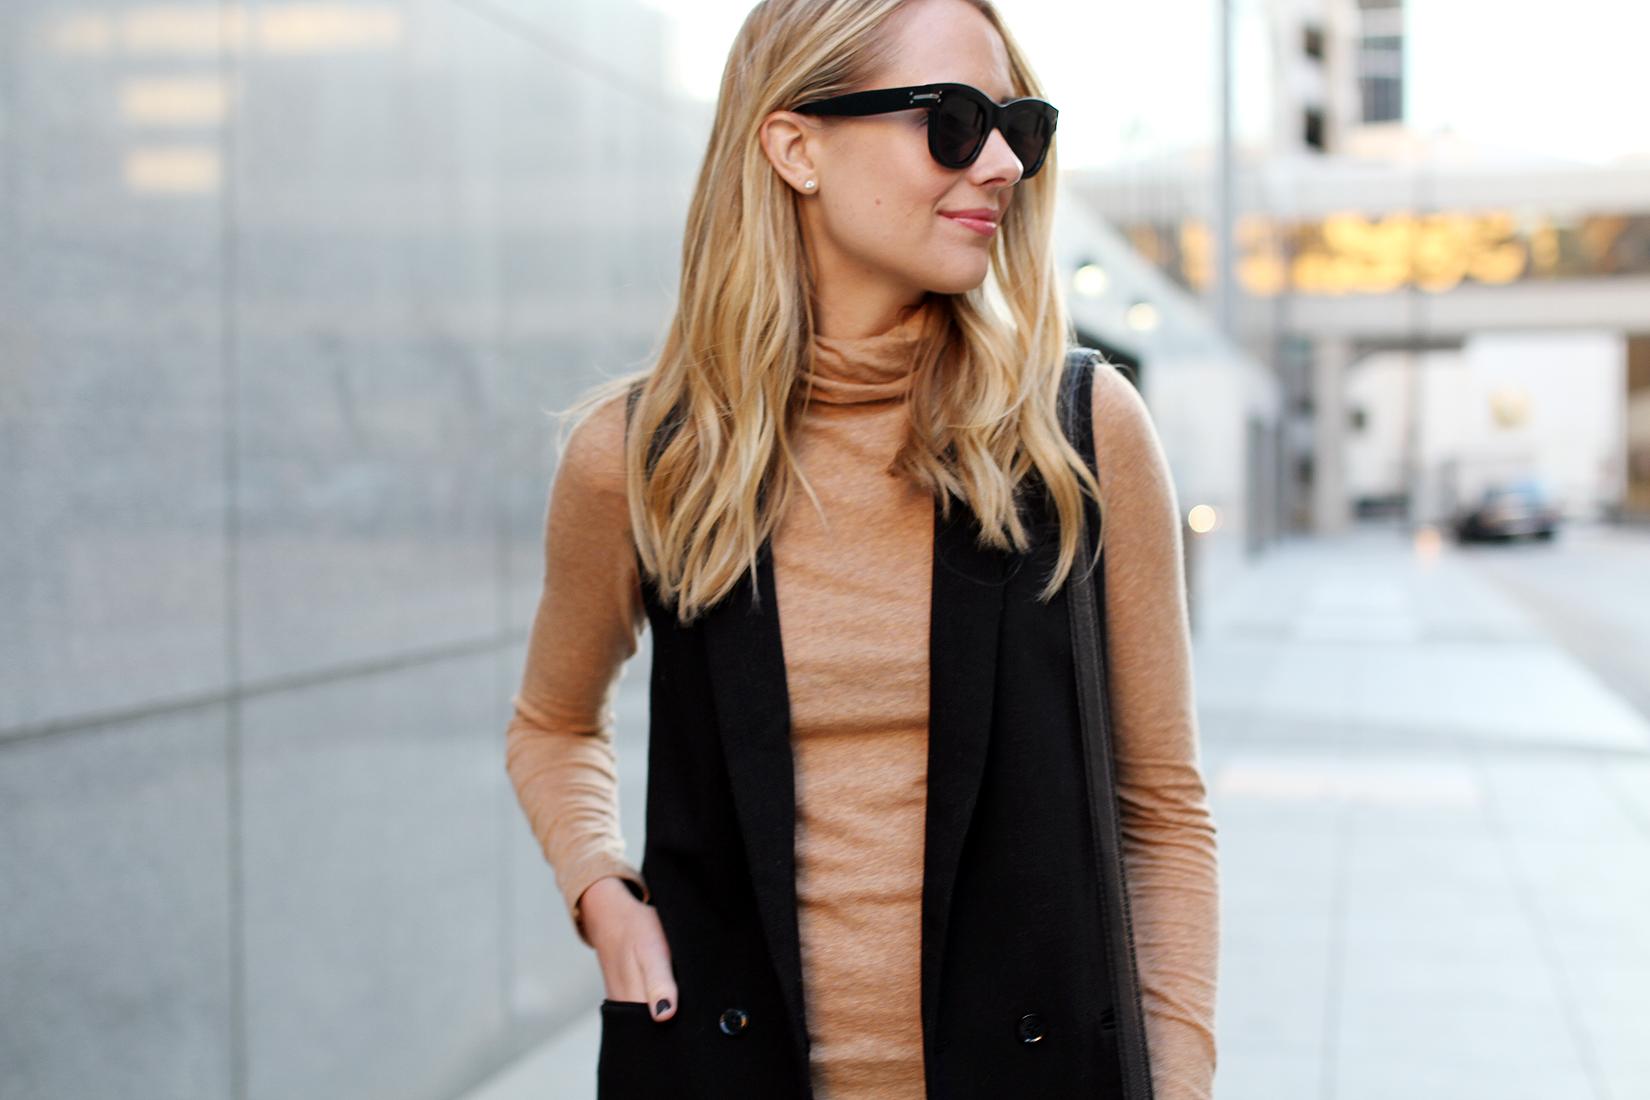 fashion-jackson-celine-sunglasses-madewell-camel-turtleneck-top-black-long-vest